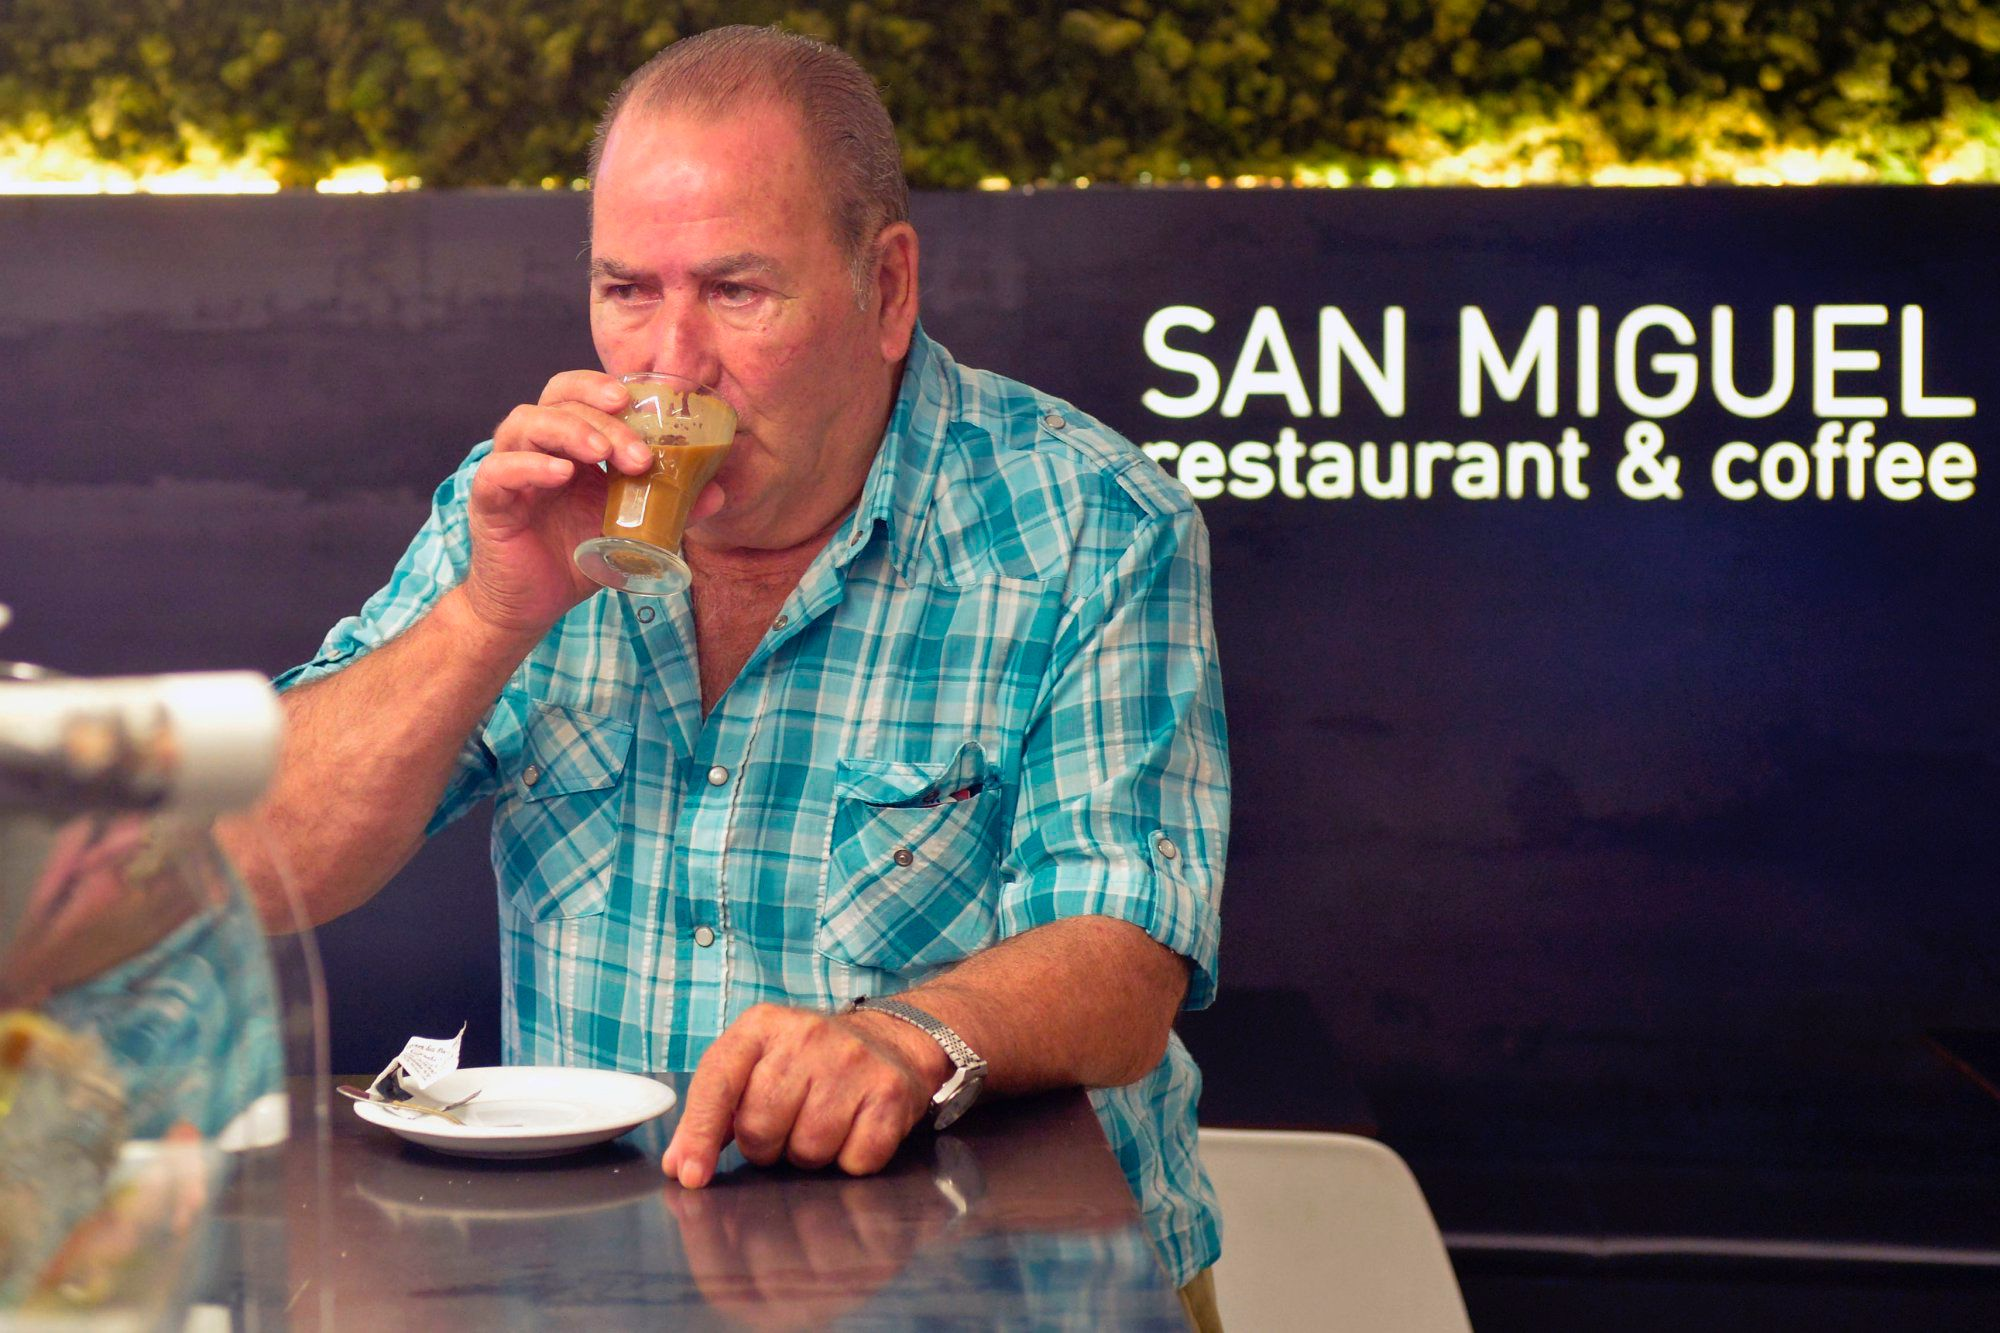 Café asiático de Cartagena (Murcia): señor tomándose un café asiático